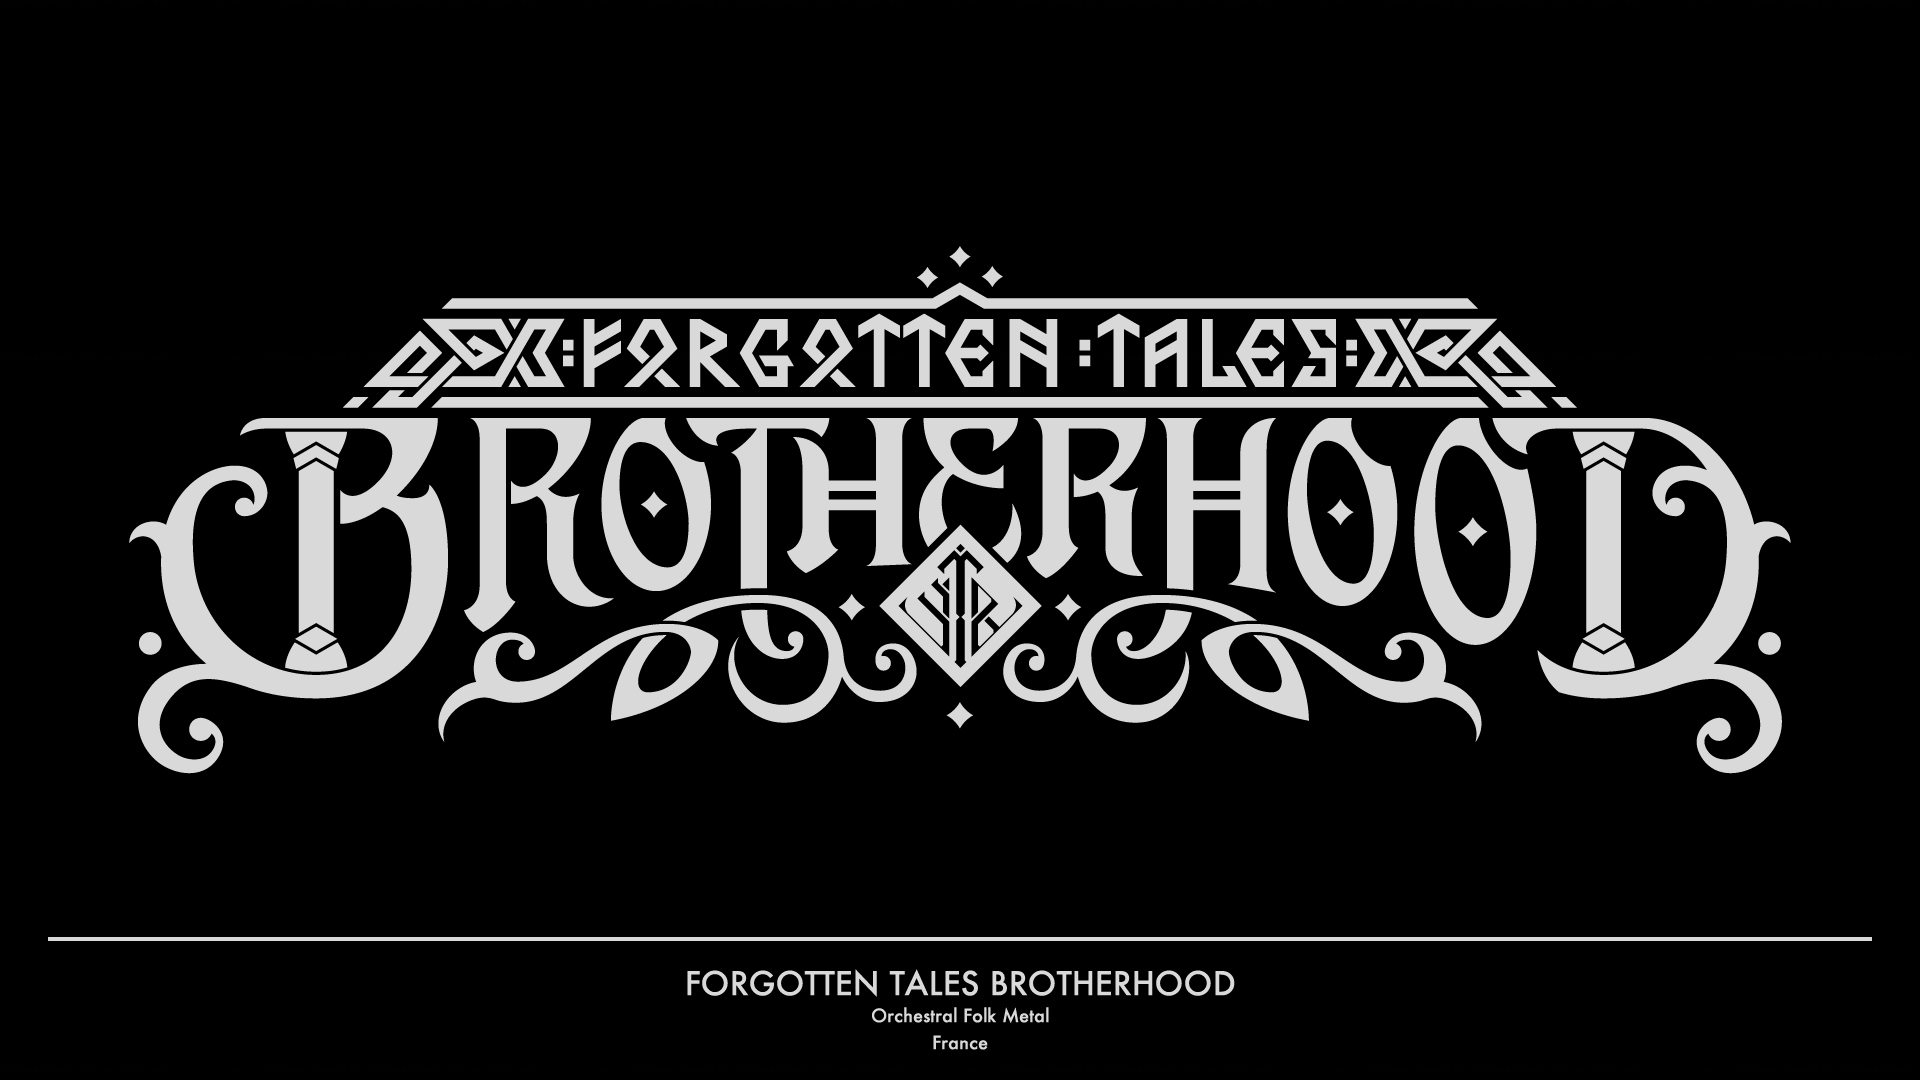 Forgotten_Tales_Brotherhood.jpg